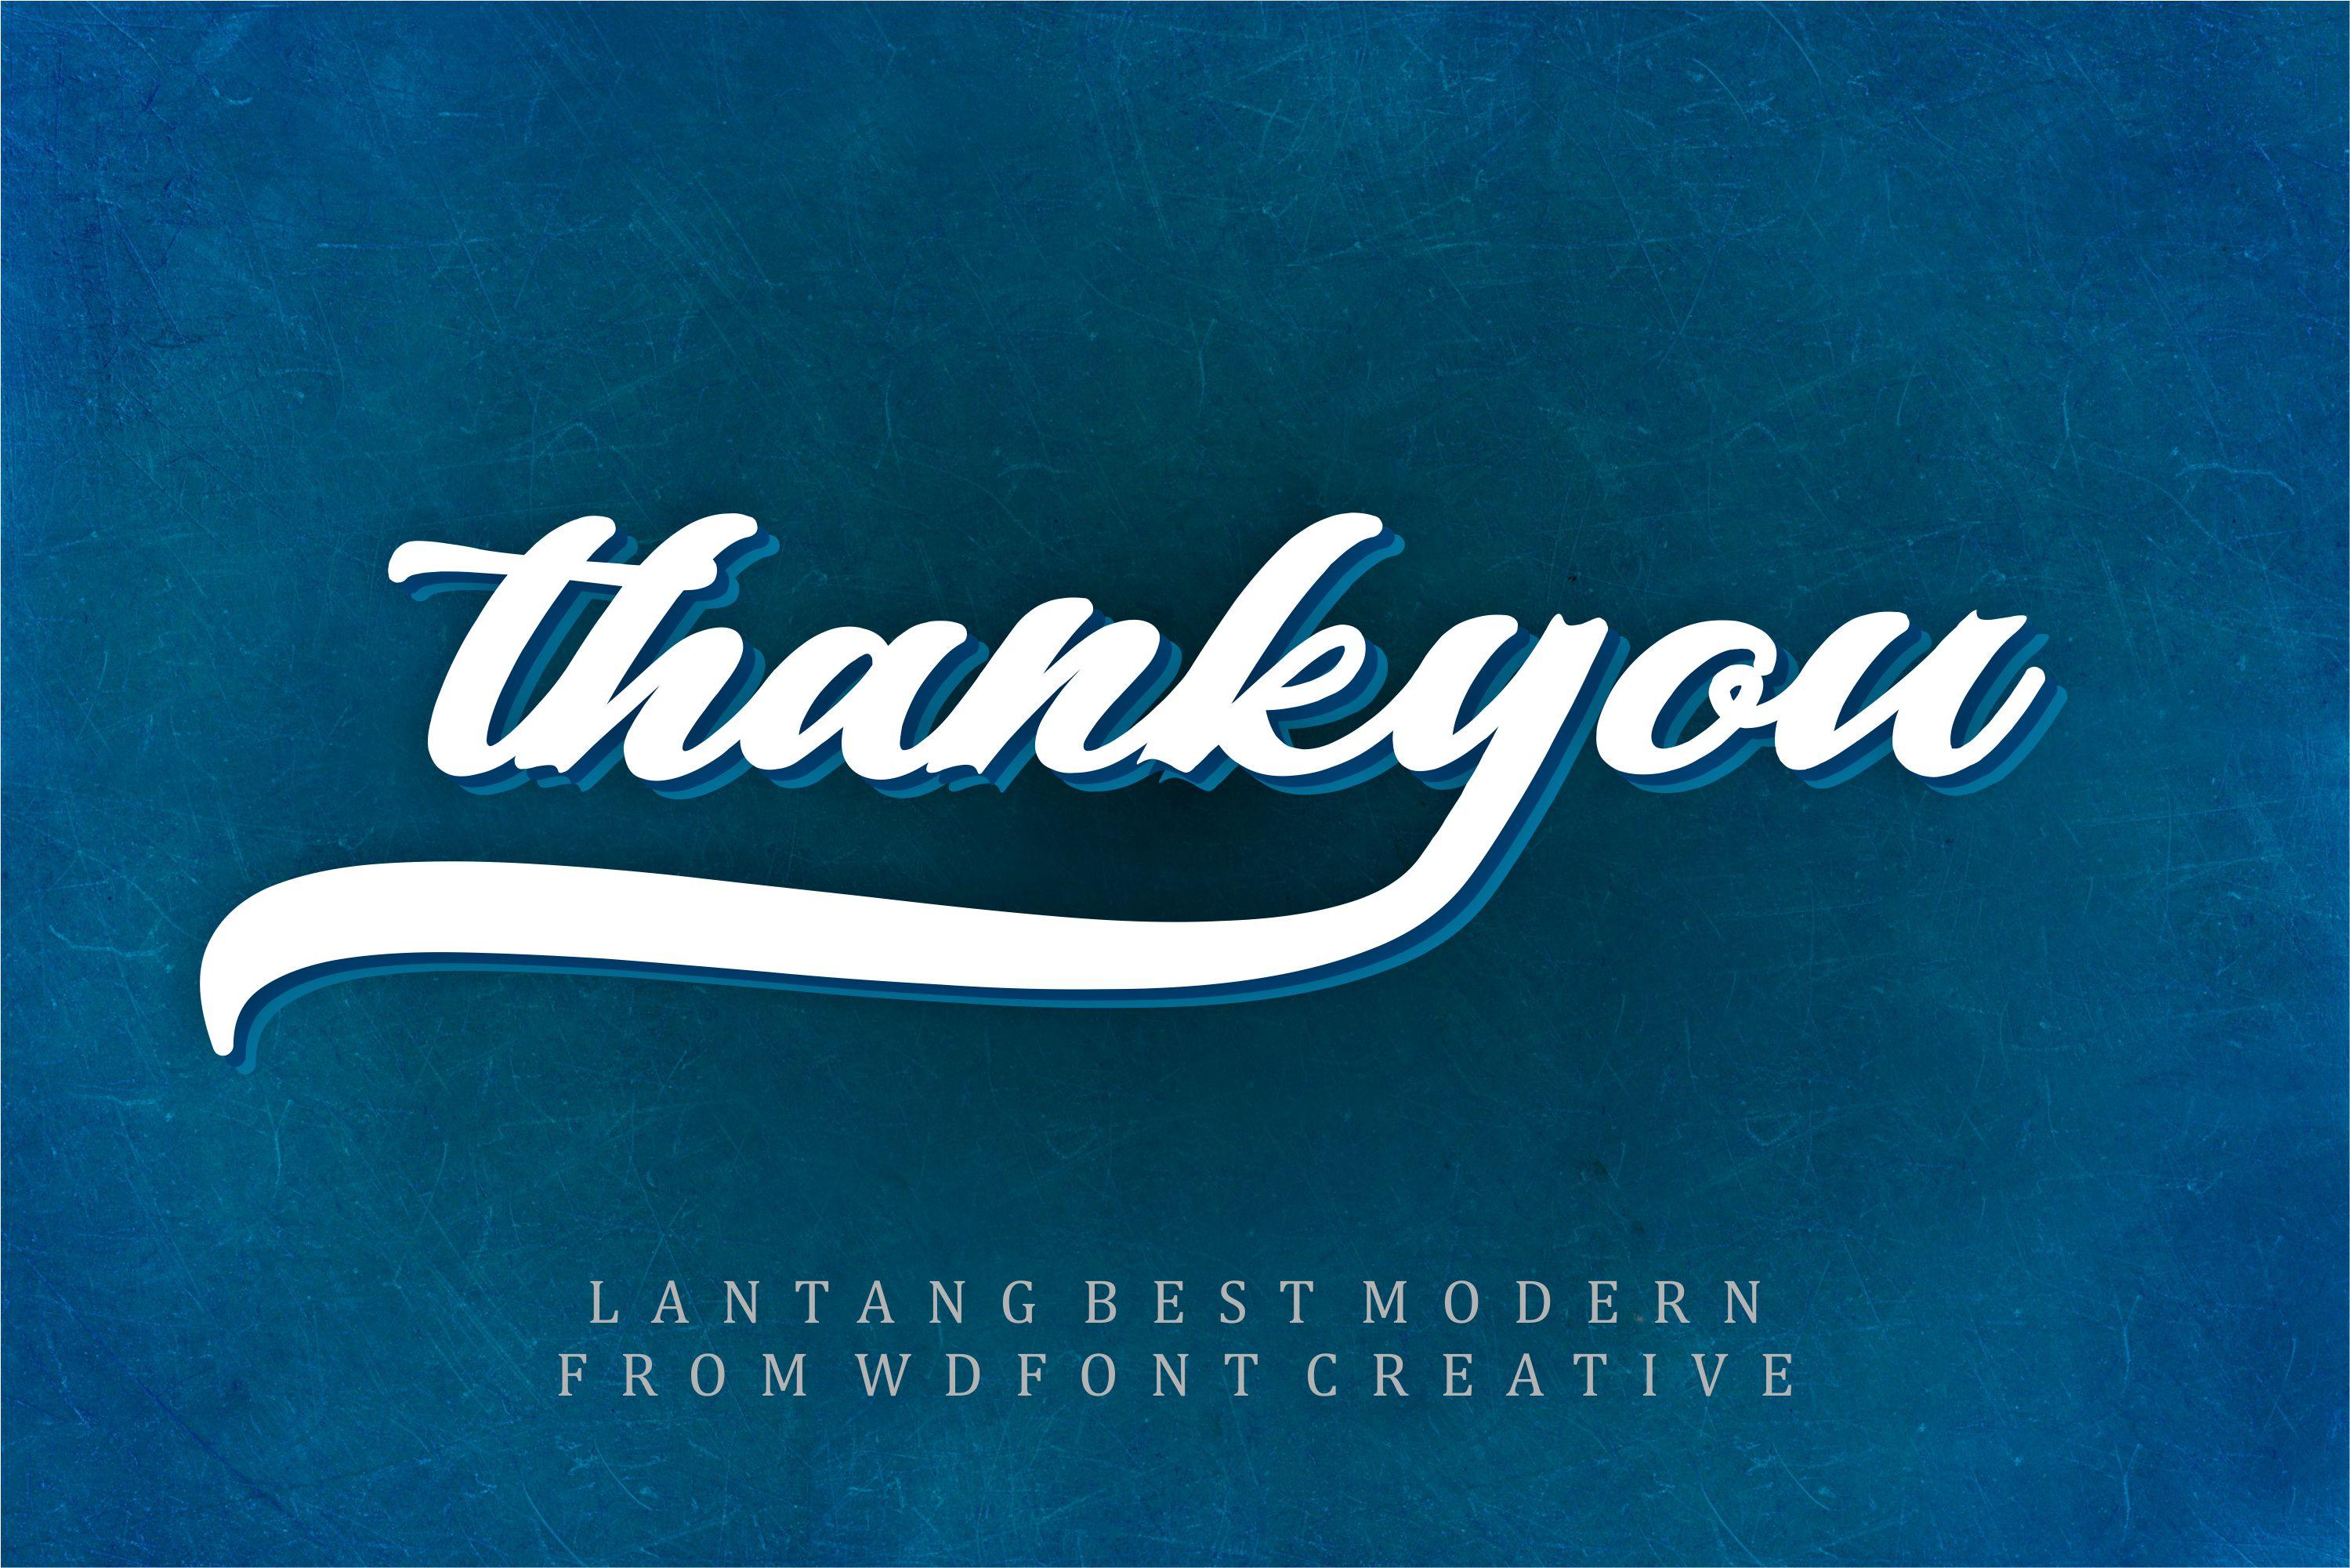 Lantang Best | Modern Stylish Font example image 5